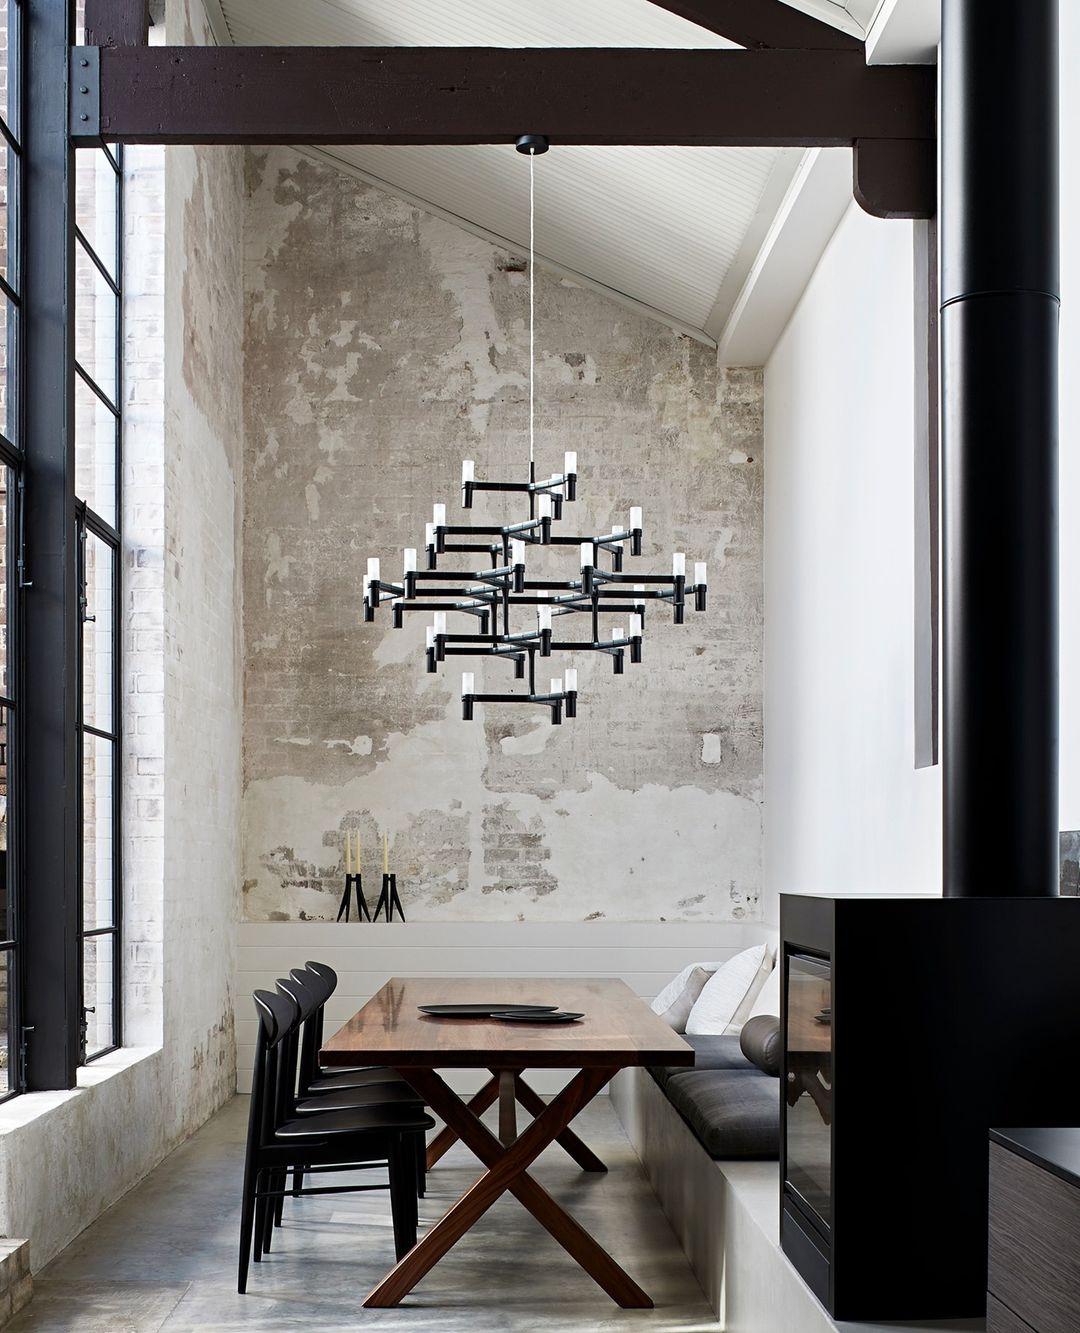 top 28 sydney interior designers Top 28 Sydney Interior Designers hareklein 1231426692291244453164826905646762216609453n